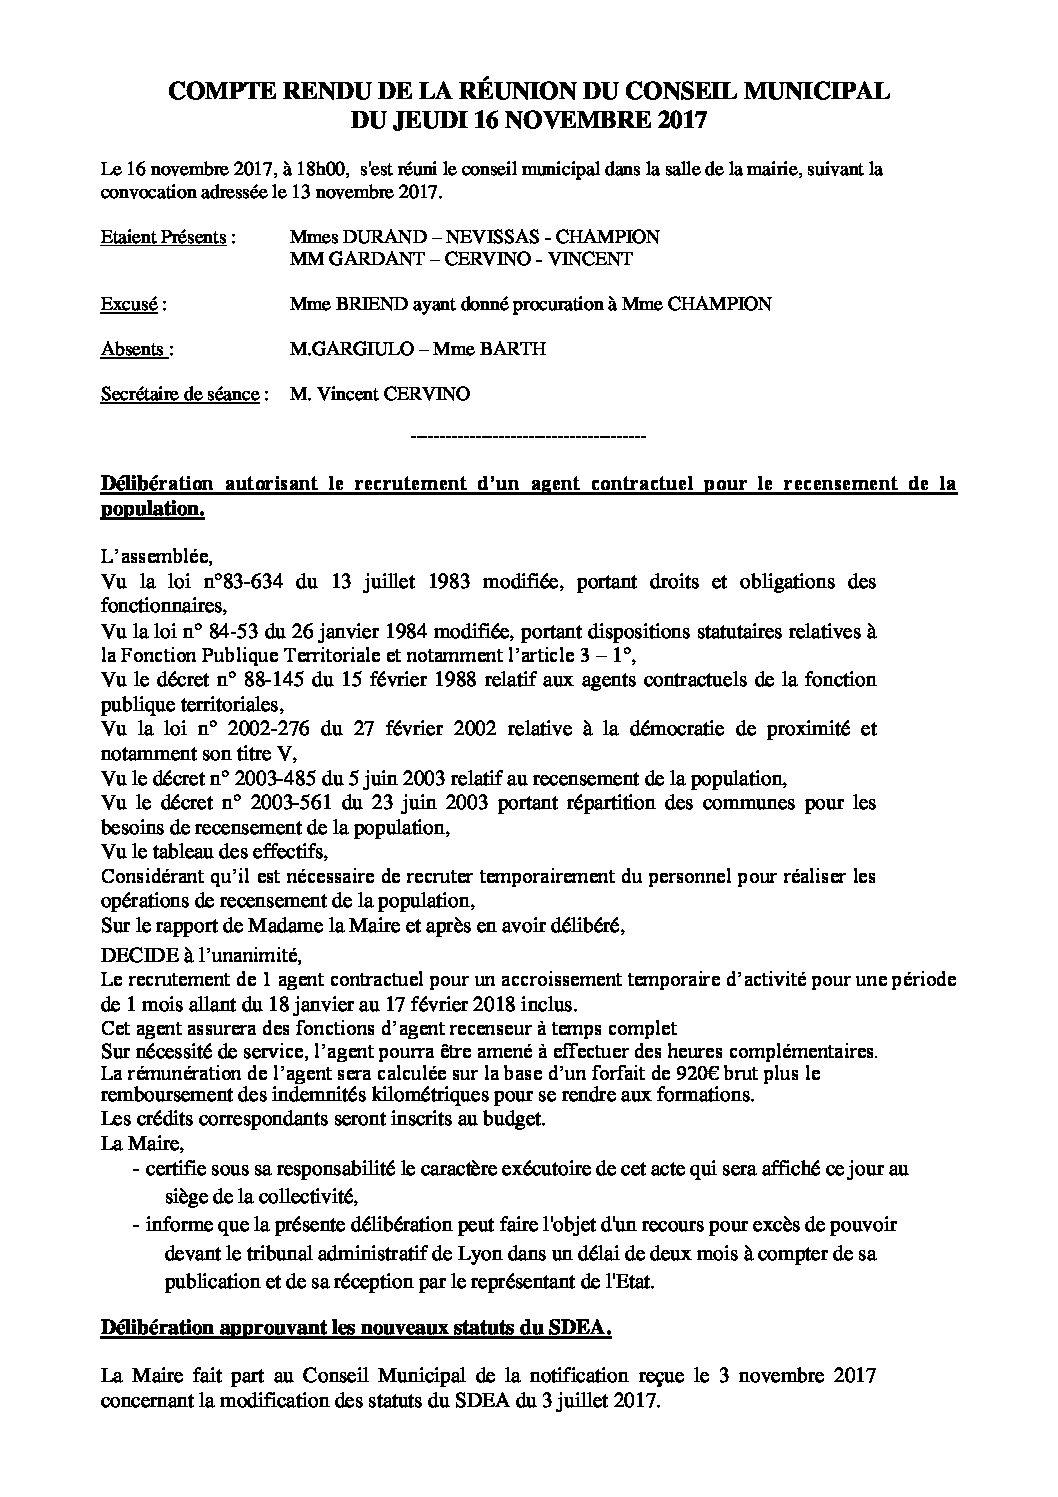 Conseil Municipal du 16 novembre 2017